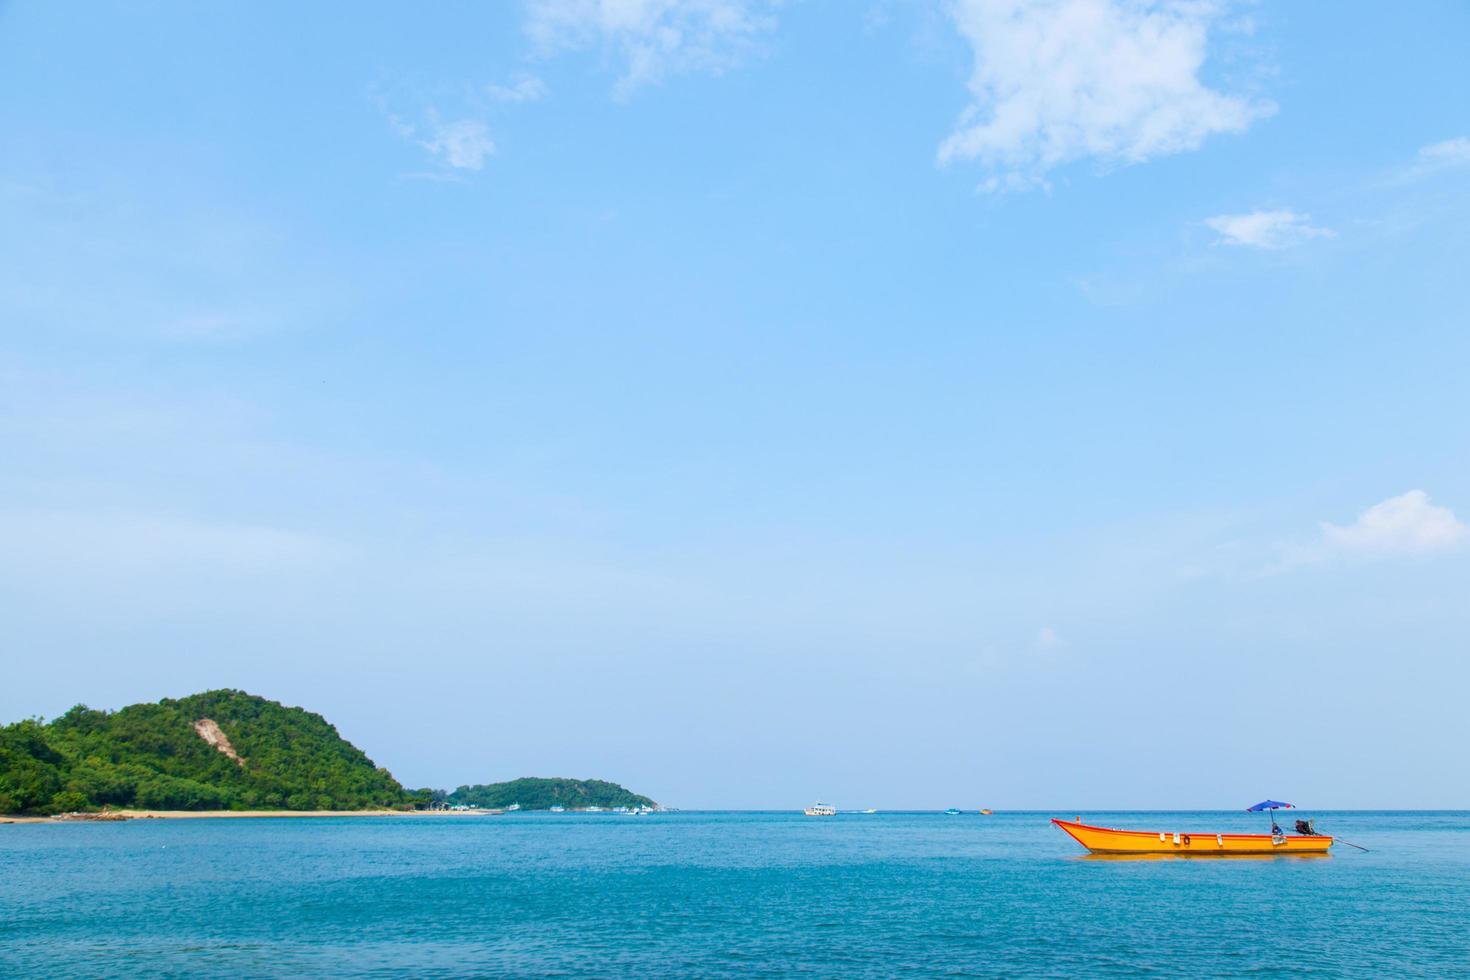 barco en el mar foto